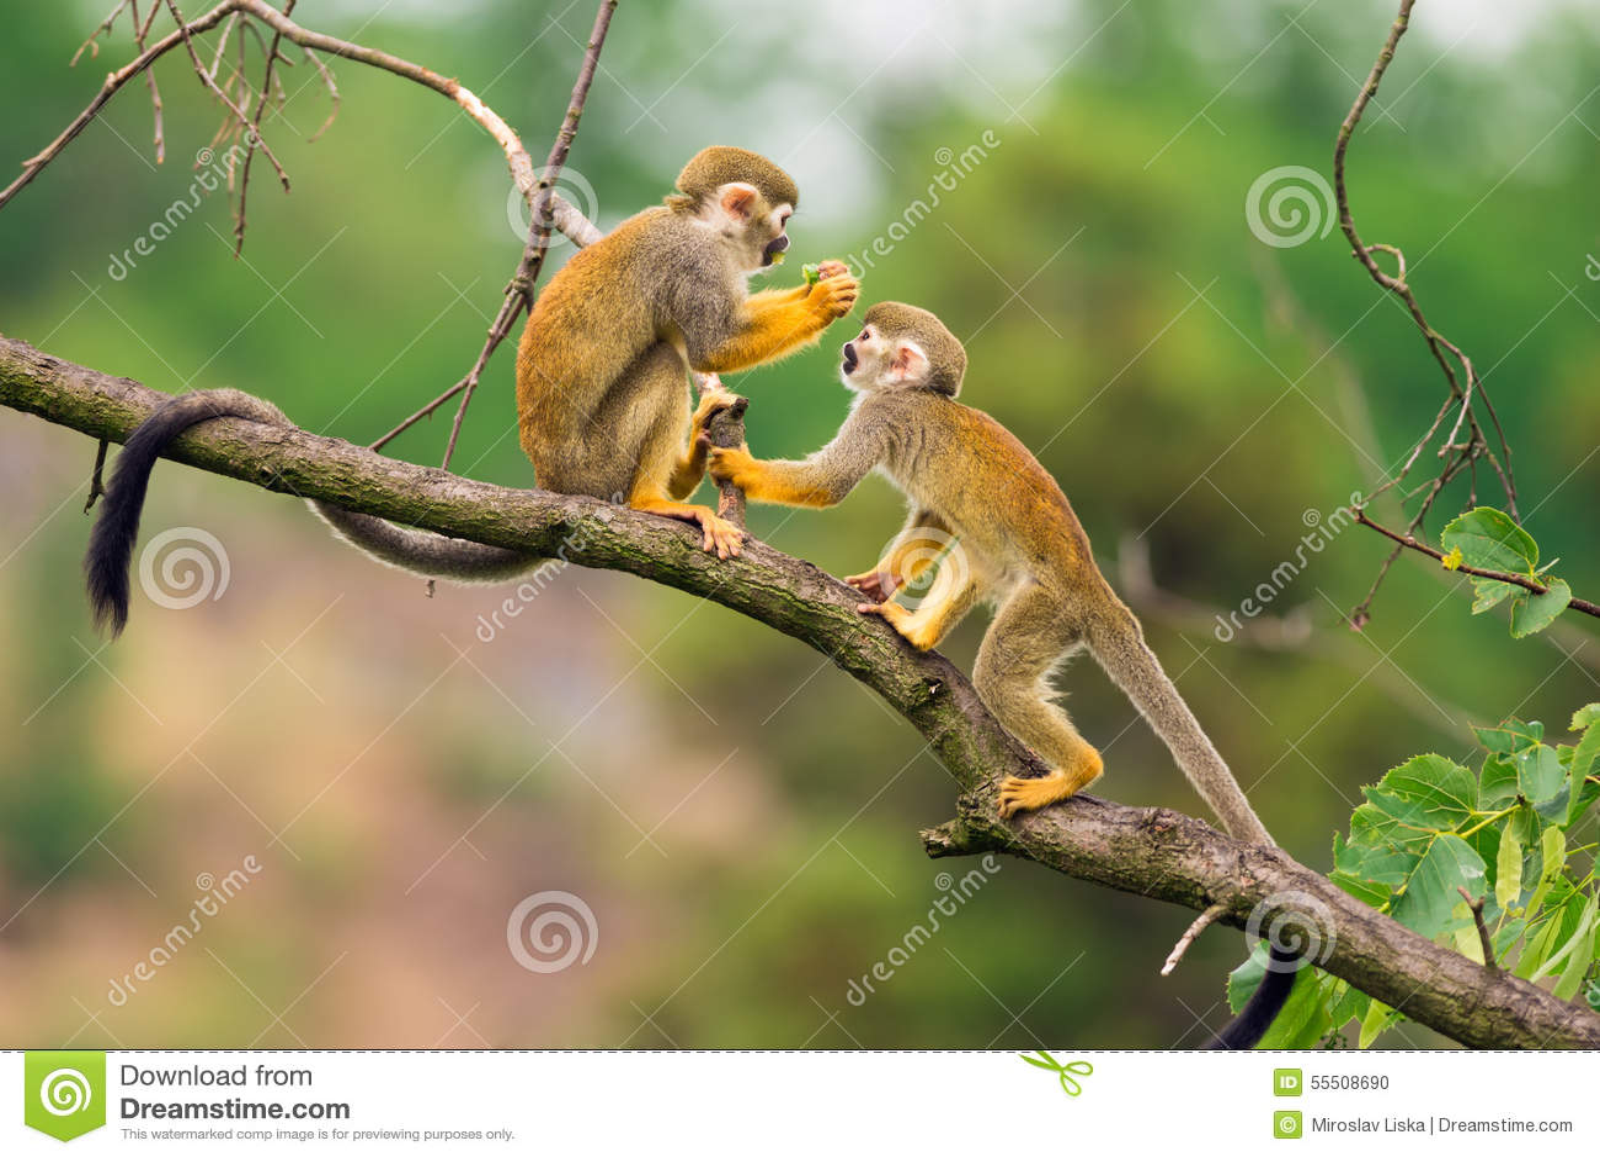 Squirrel monkeys in trees - photo#16